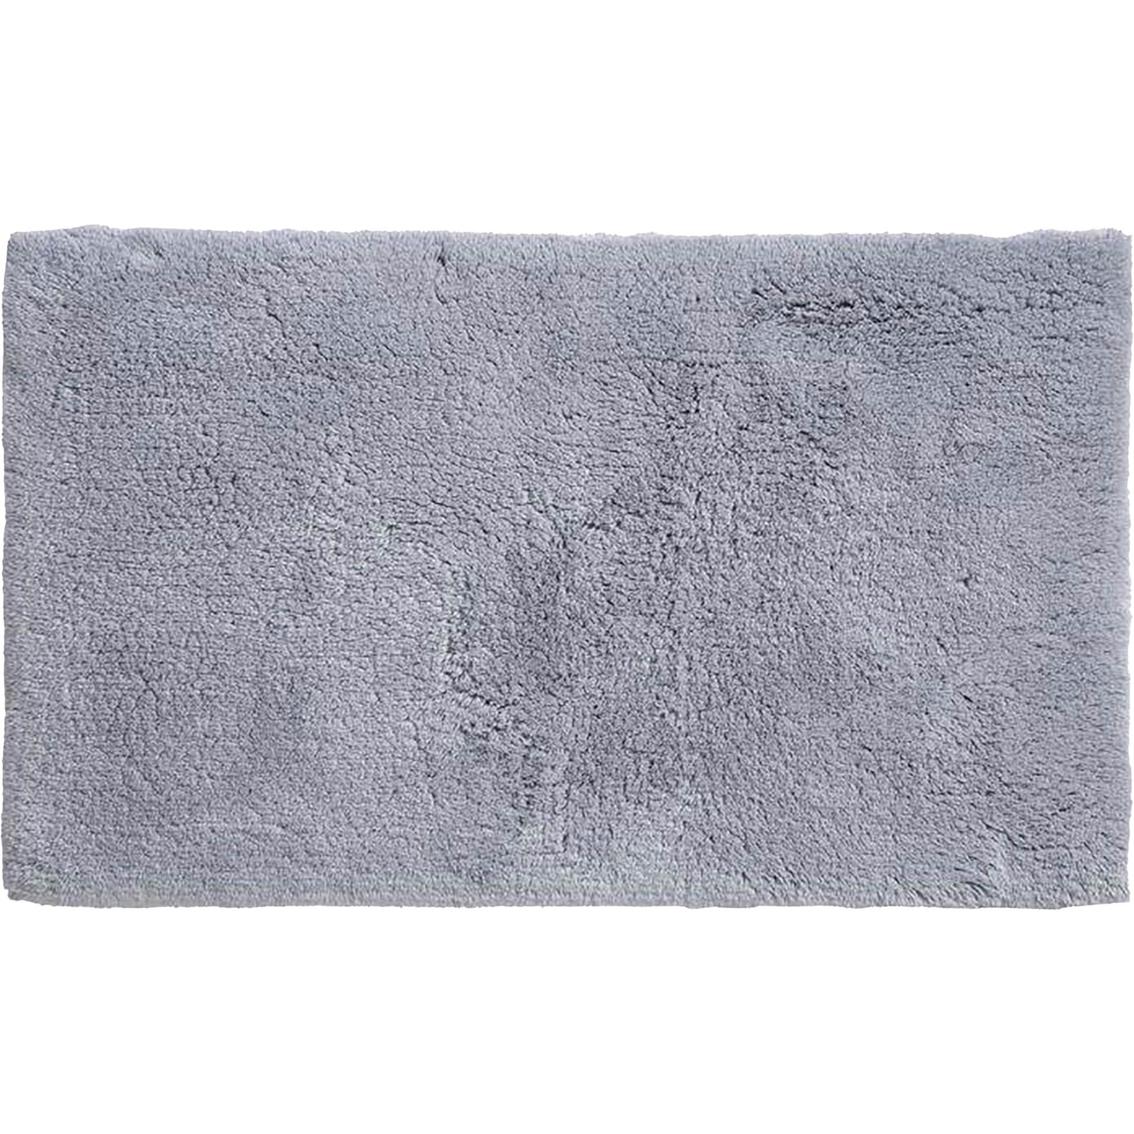 Certified 100 Organic Cotton Bath Rugs